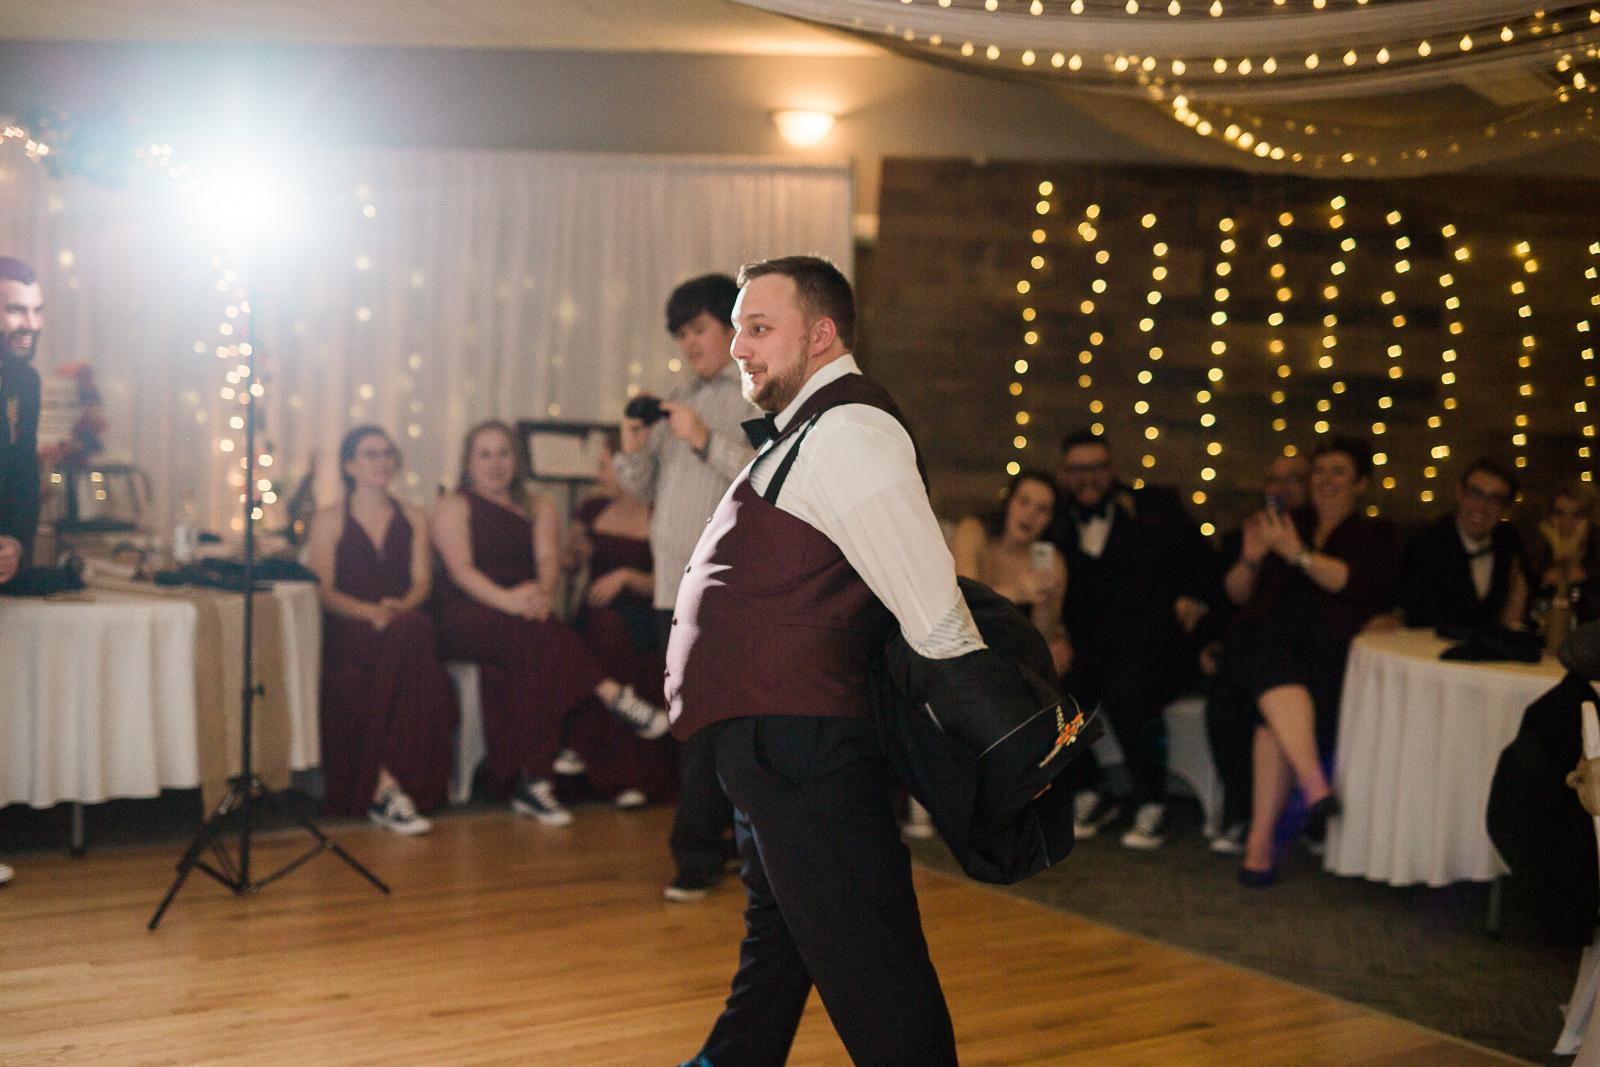 gander-wedding-photographer-155.jpg